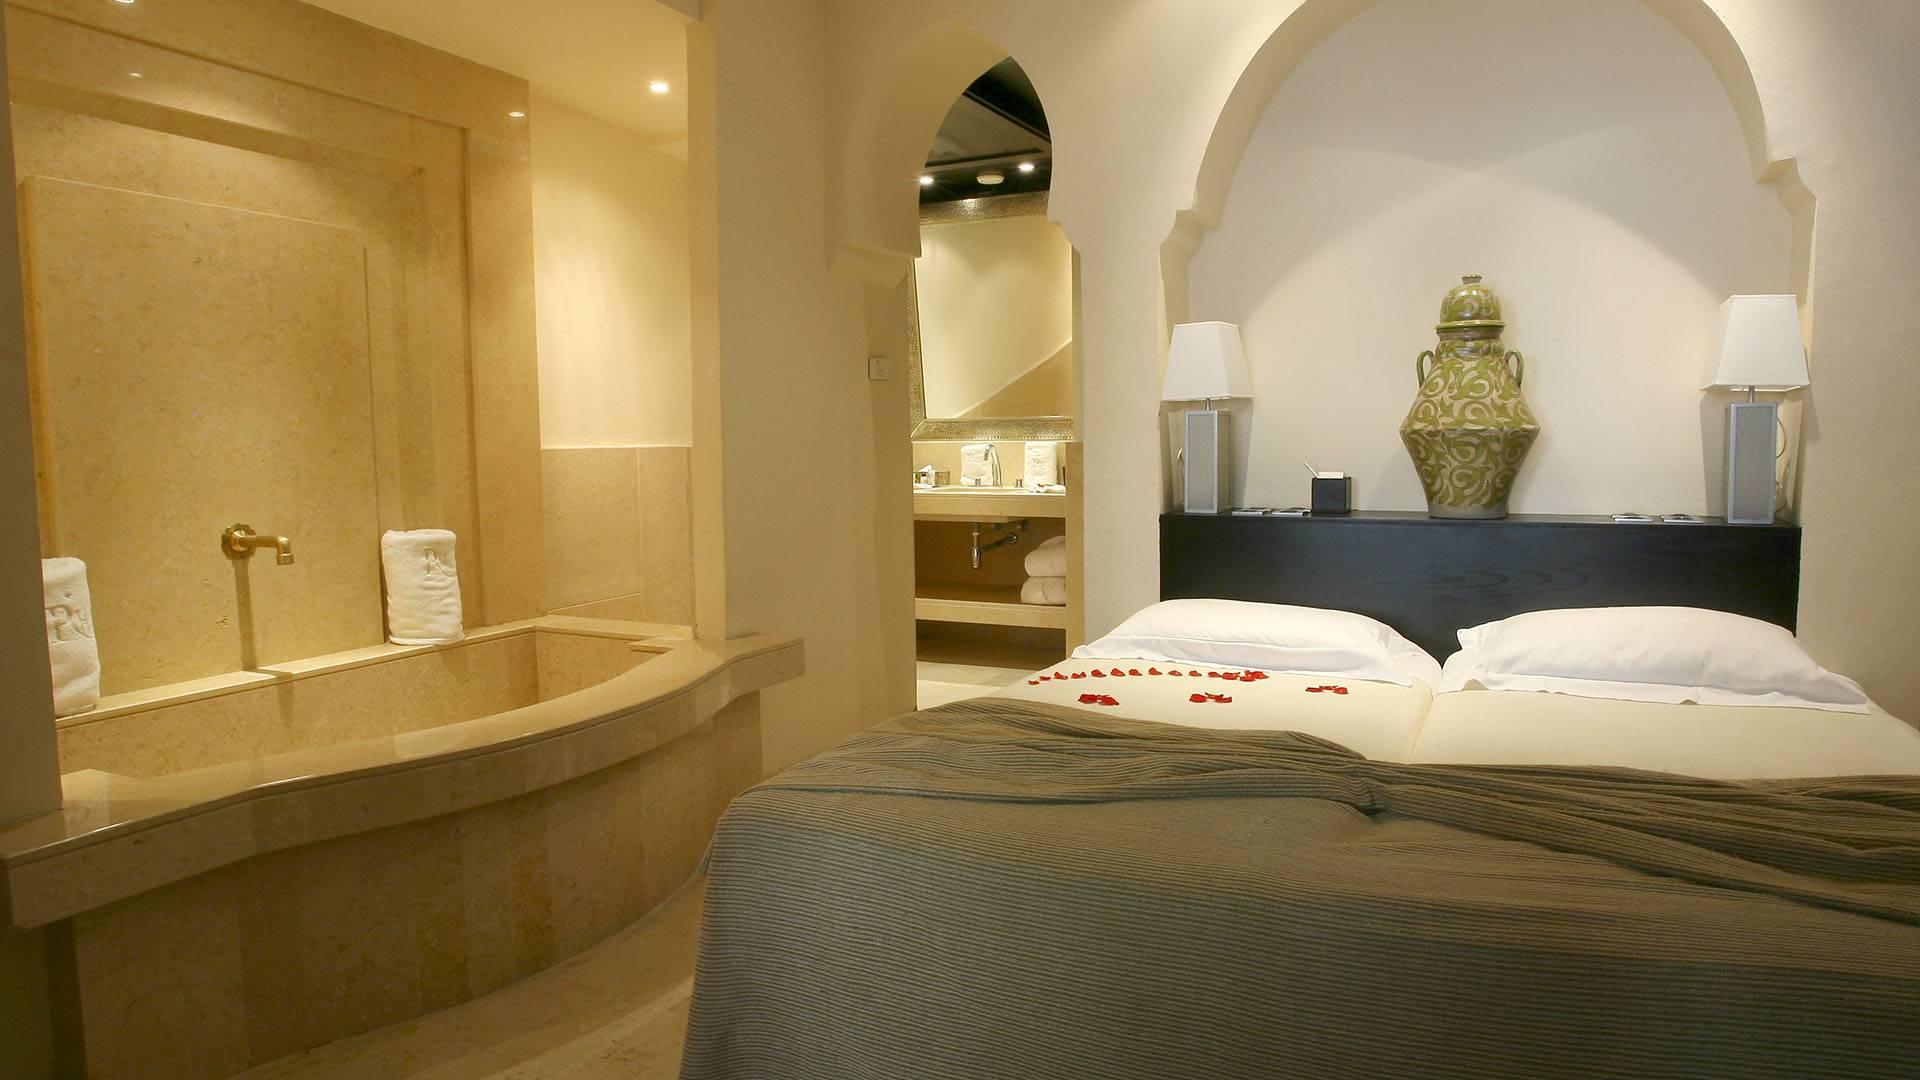 Morocco Golf Stay In Marrakech At The Hotel Les Jardins De La Koutoubia